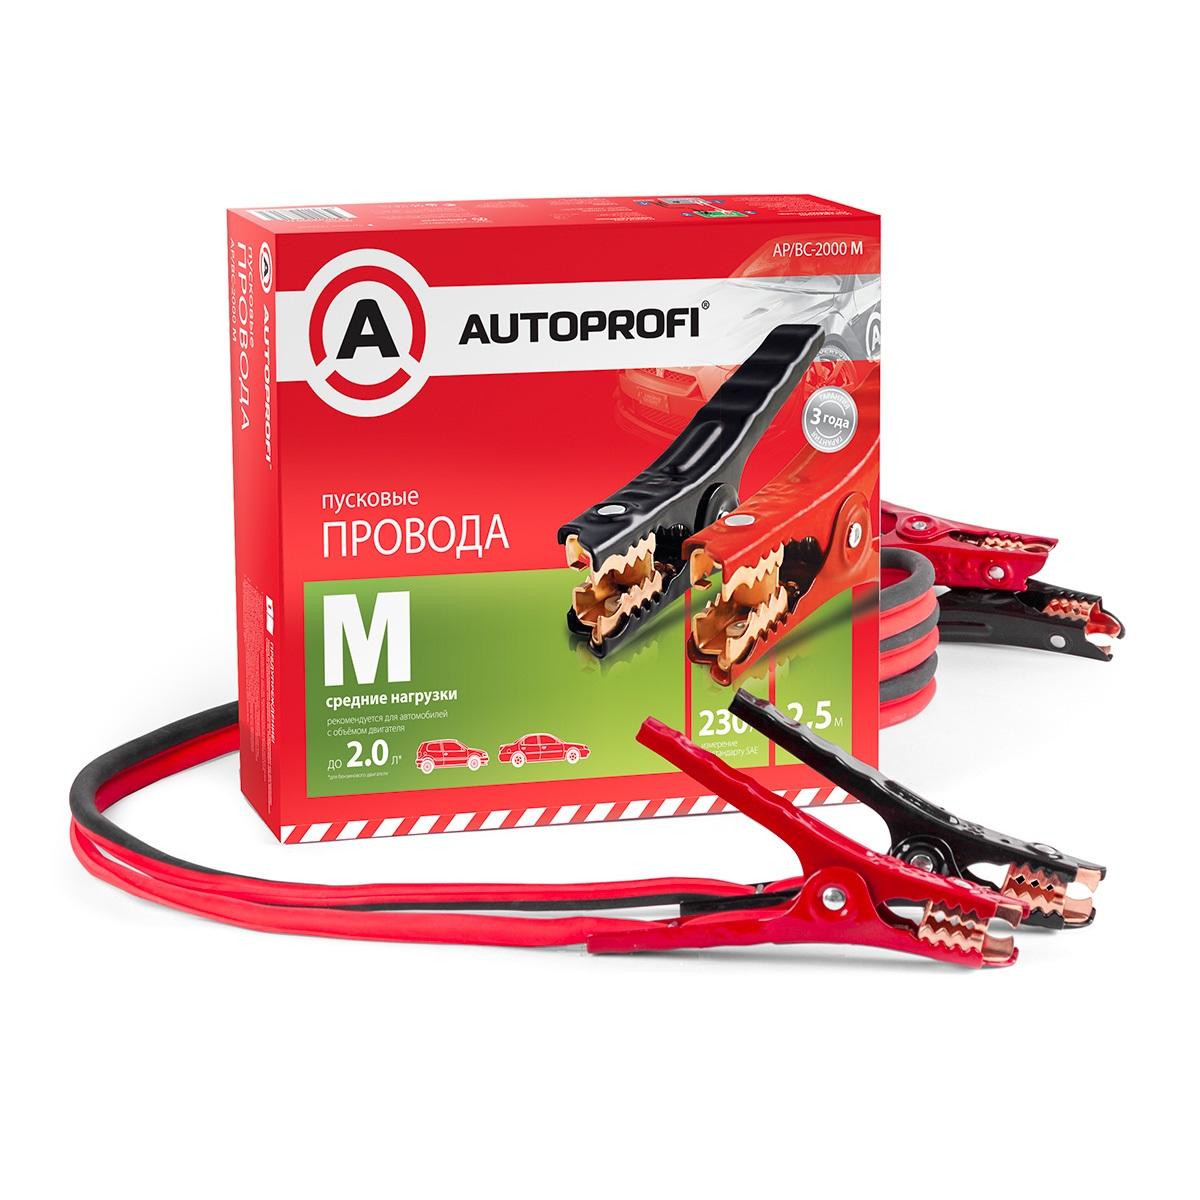 Провода прикуривания Autoprofi Ap/bc - 2000 m autoprofi